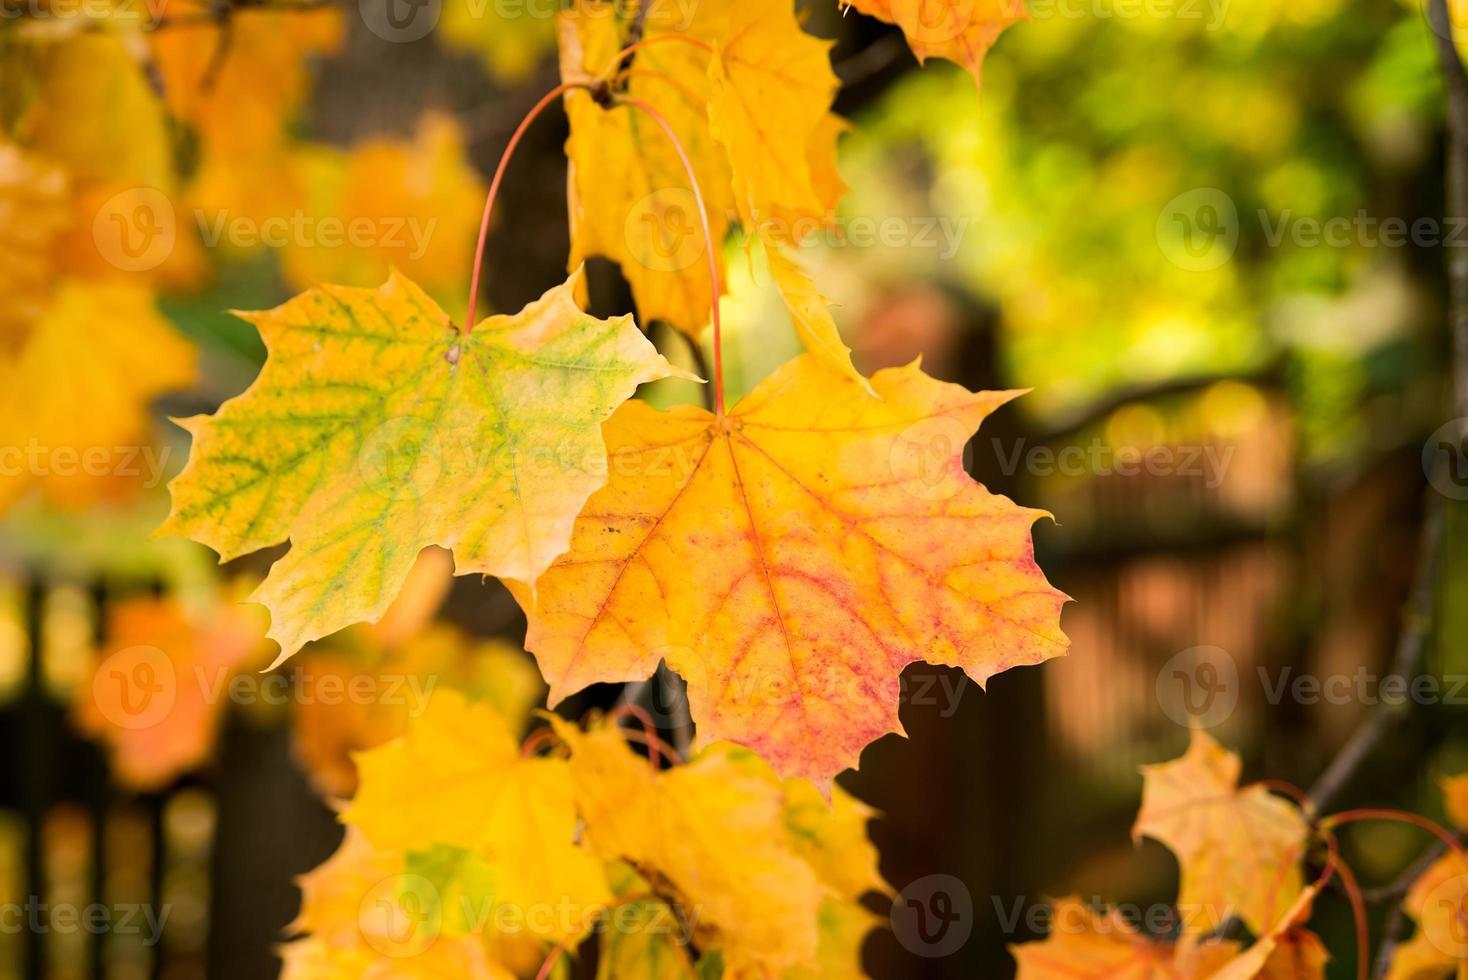 Golden autumn, red leafs. Fall, seasonal nature, beautiful foliage photo